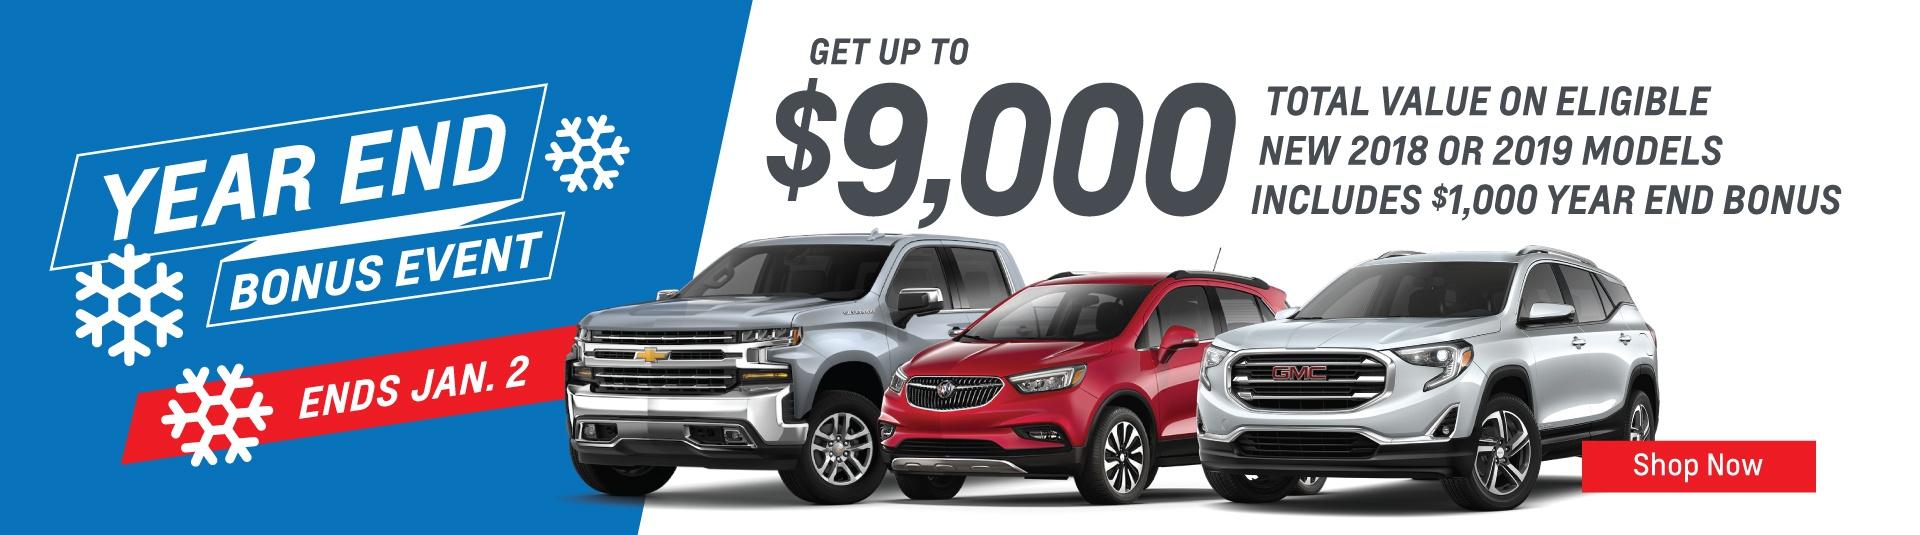 Humberview Chevrolet Buick GMC Sales in Etobicoke